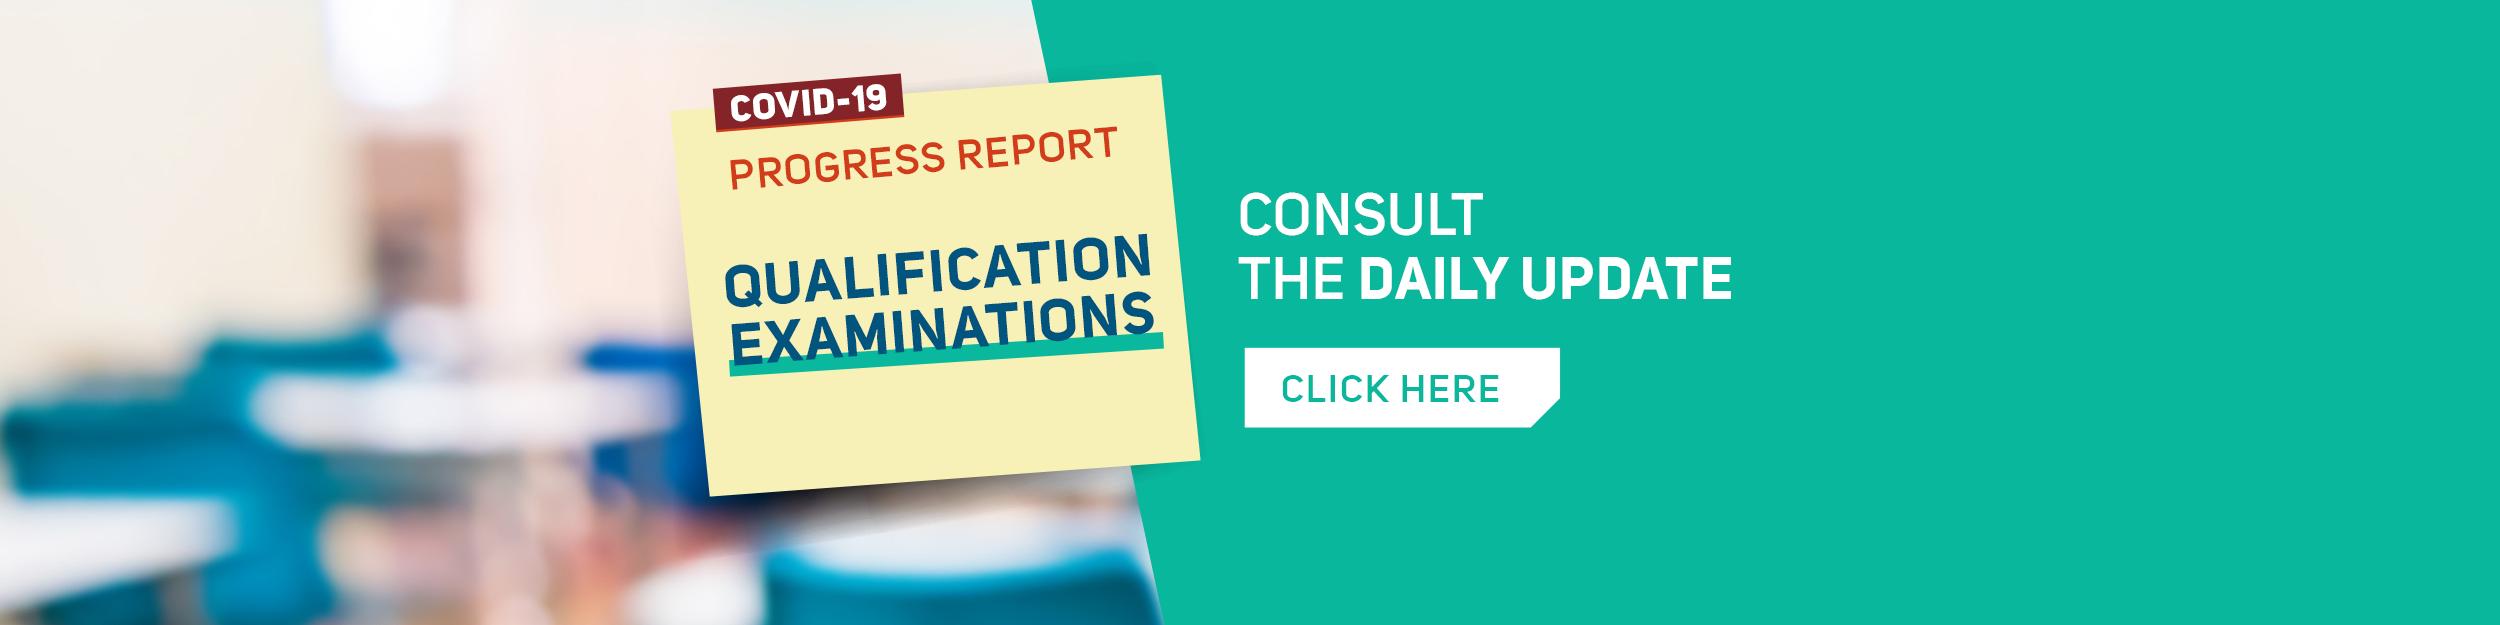 Qualification examinations progress report